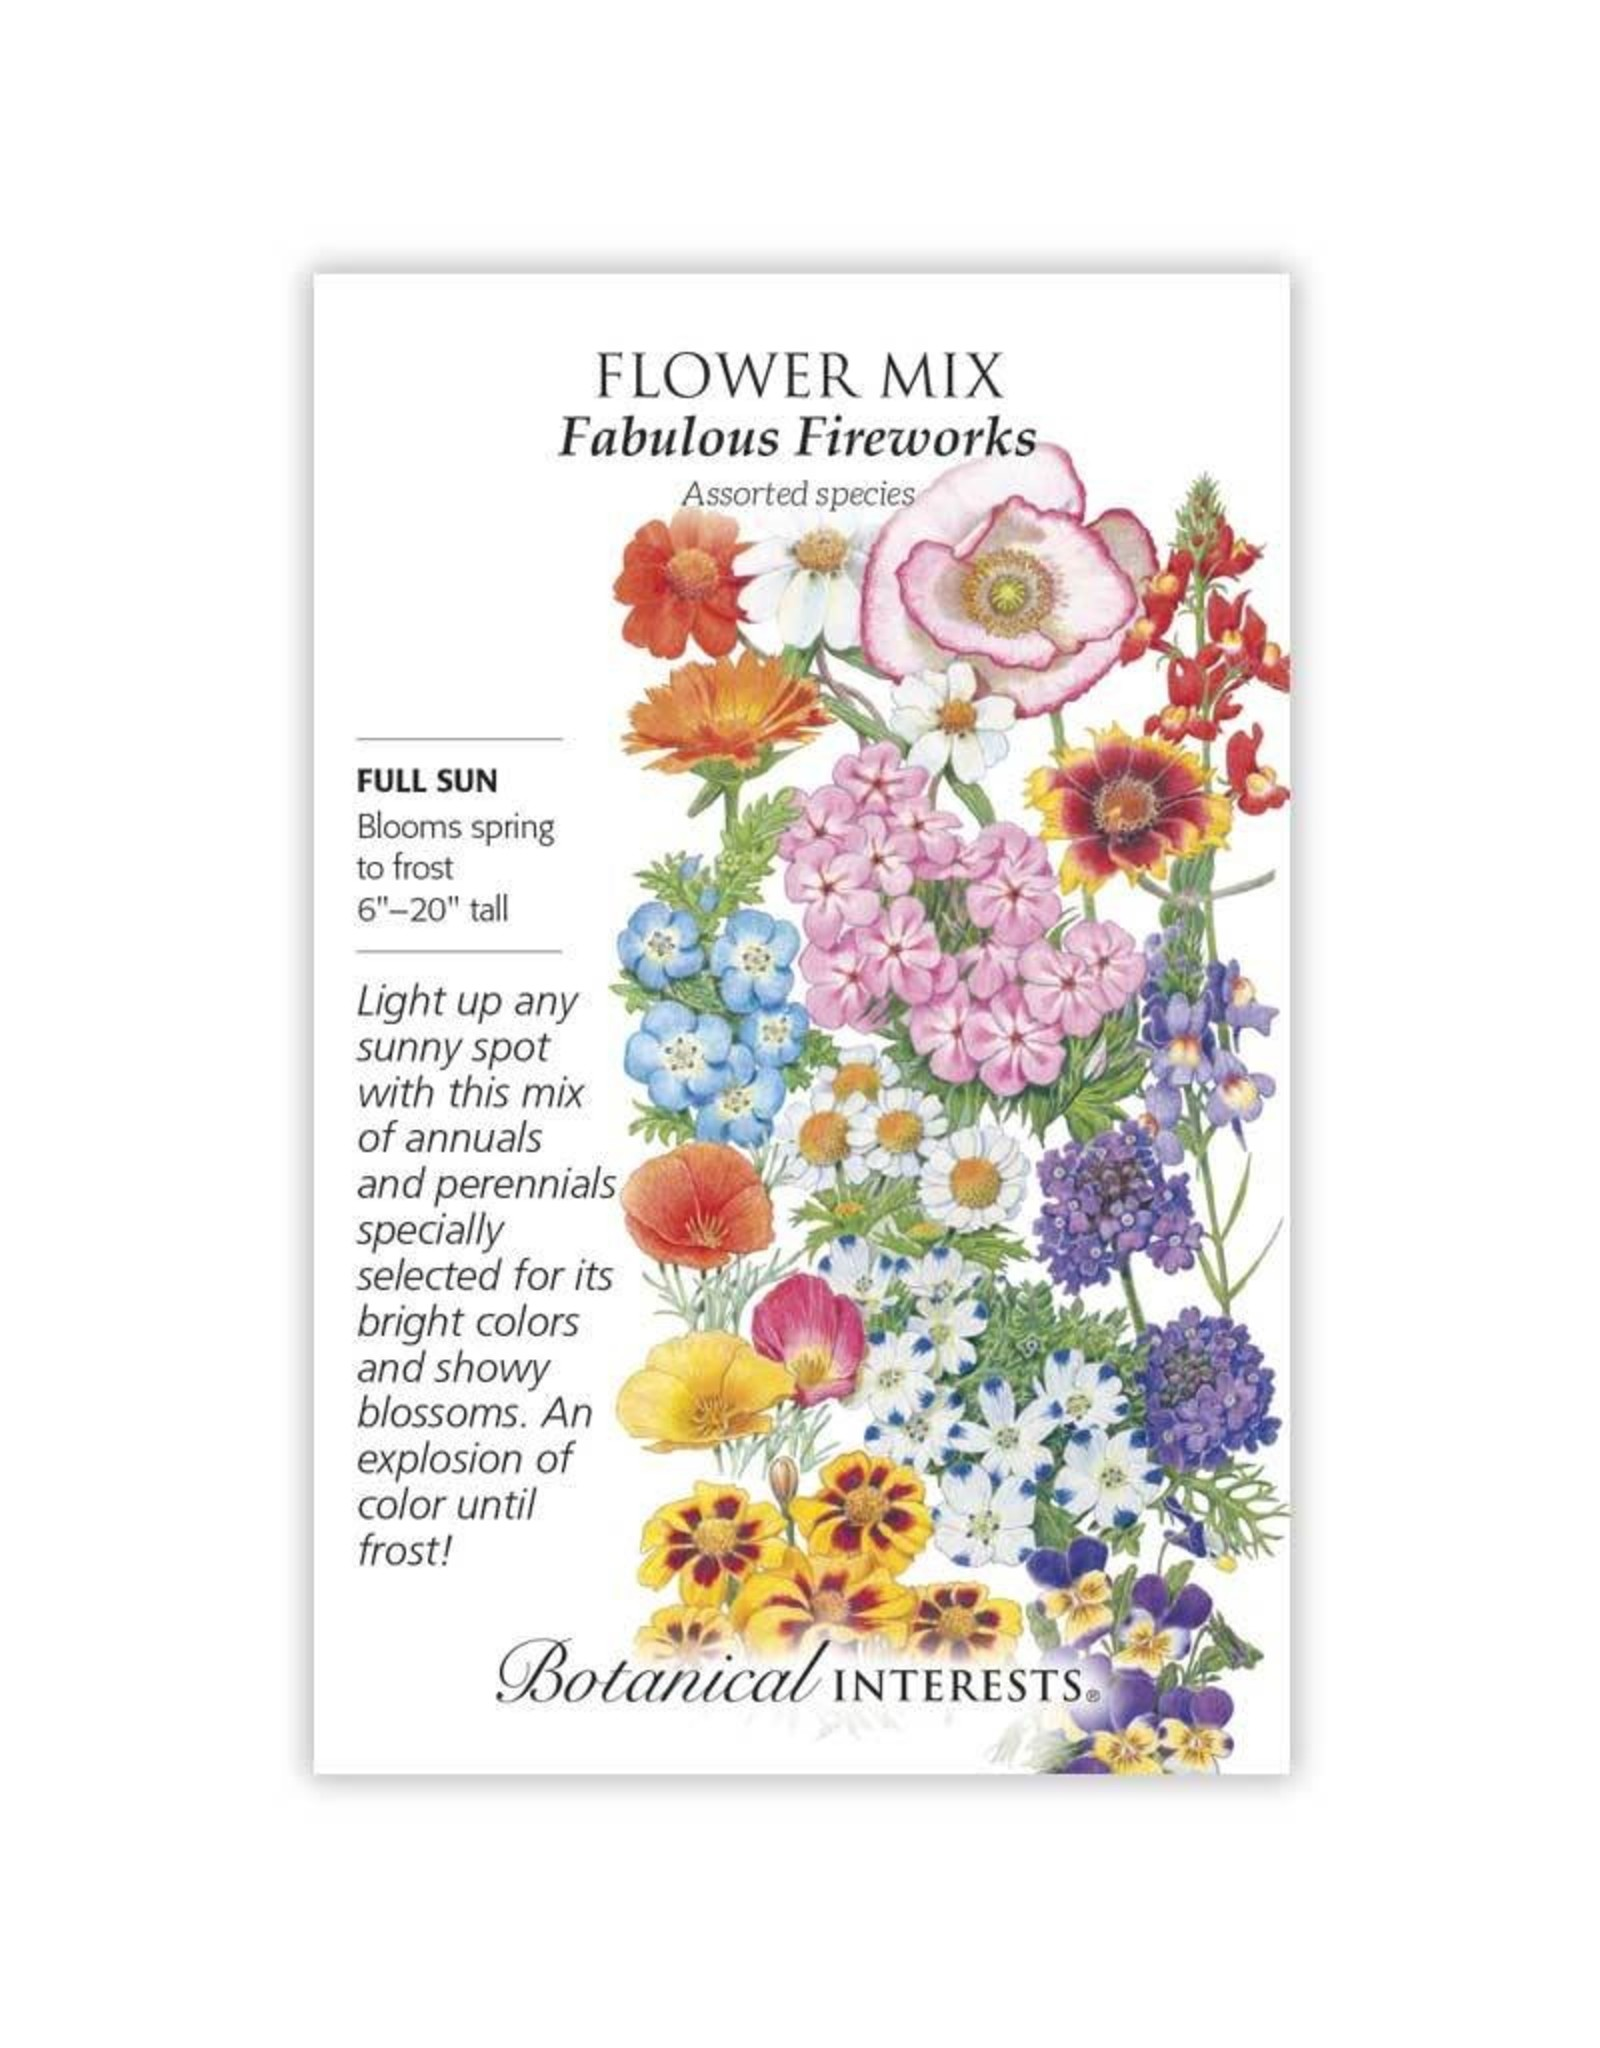 Seeds - Flower Mix Fabulous Fireworks, Large